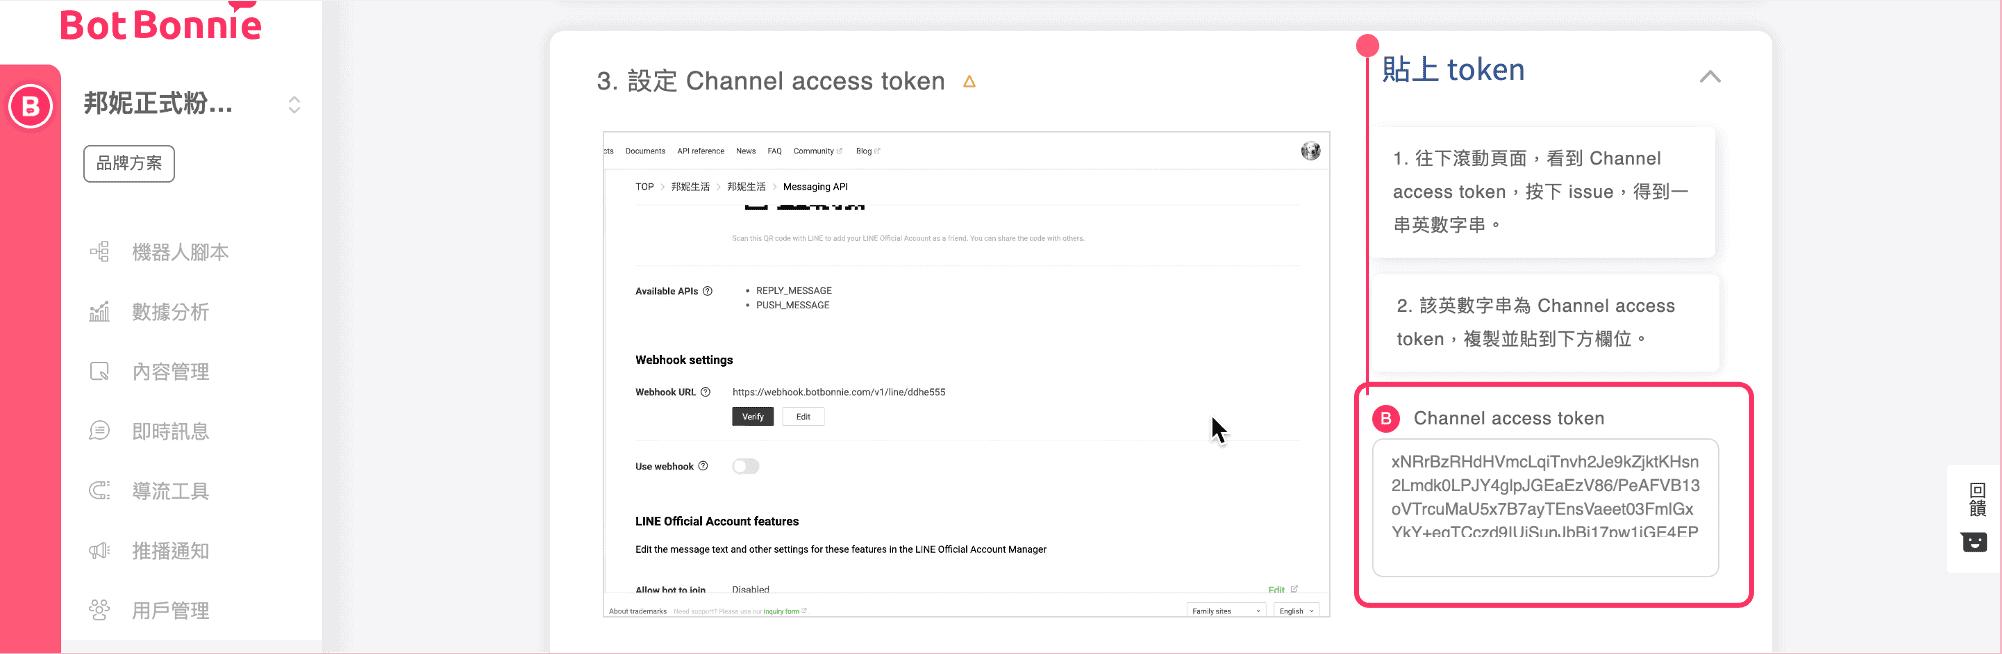 至 BotBonnie 後台貼上 token